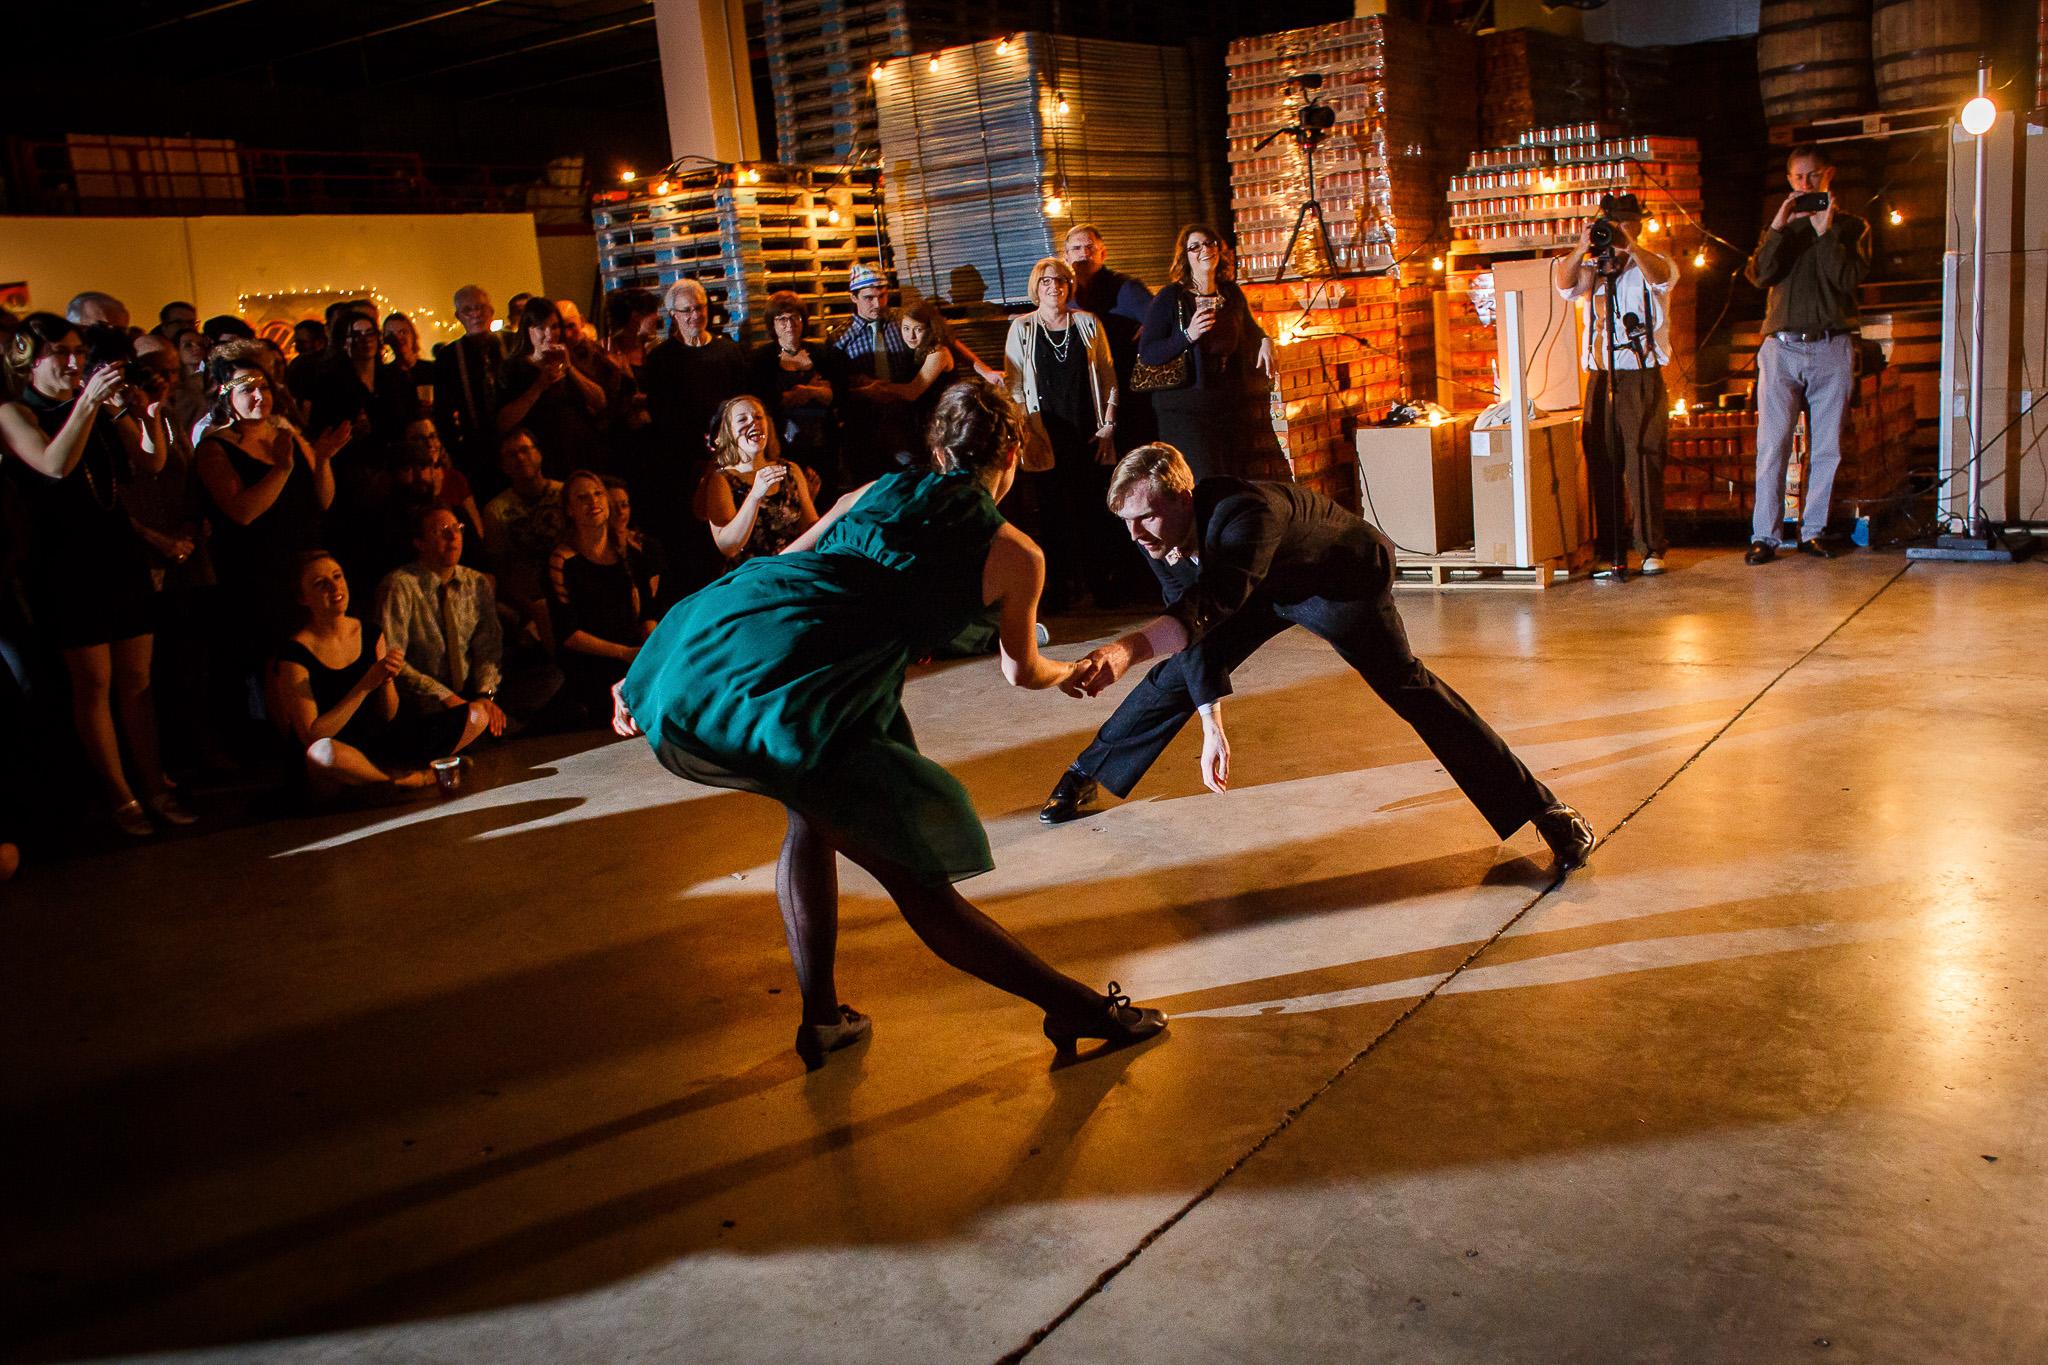 dance-lindy-hop-denver-230.jpg